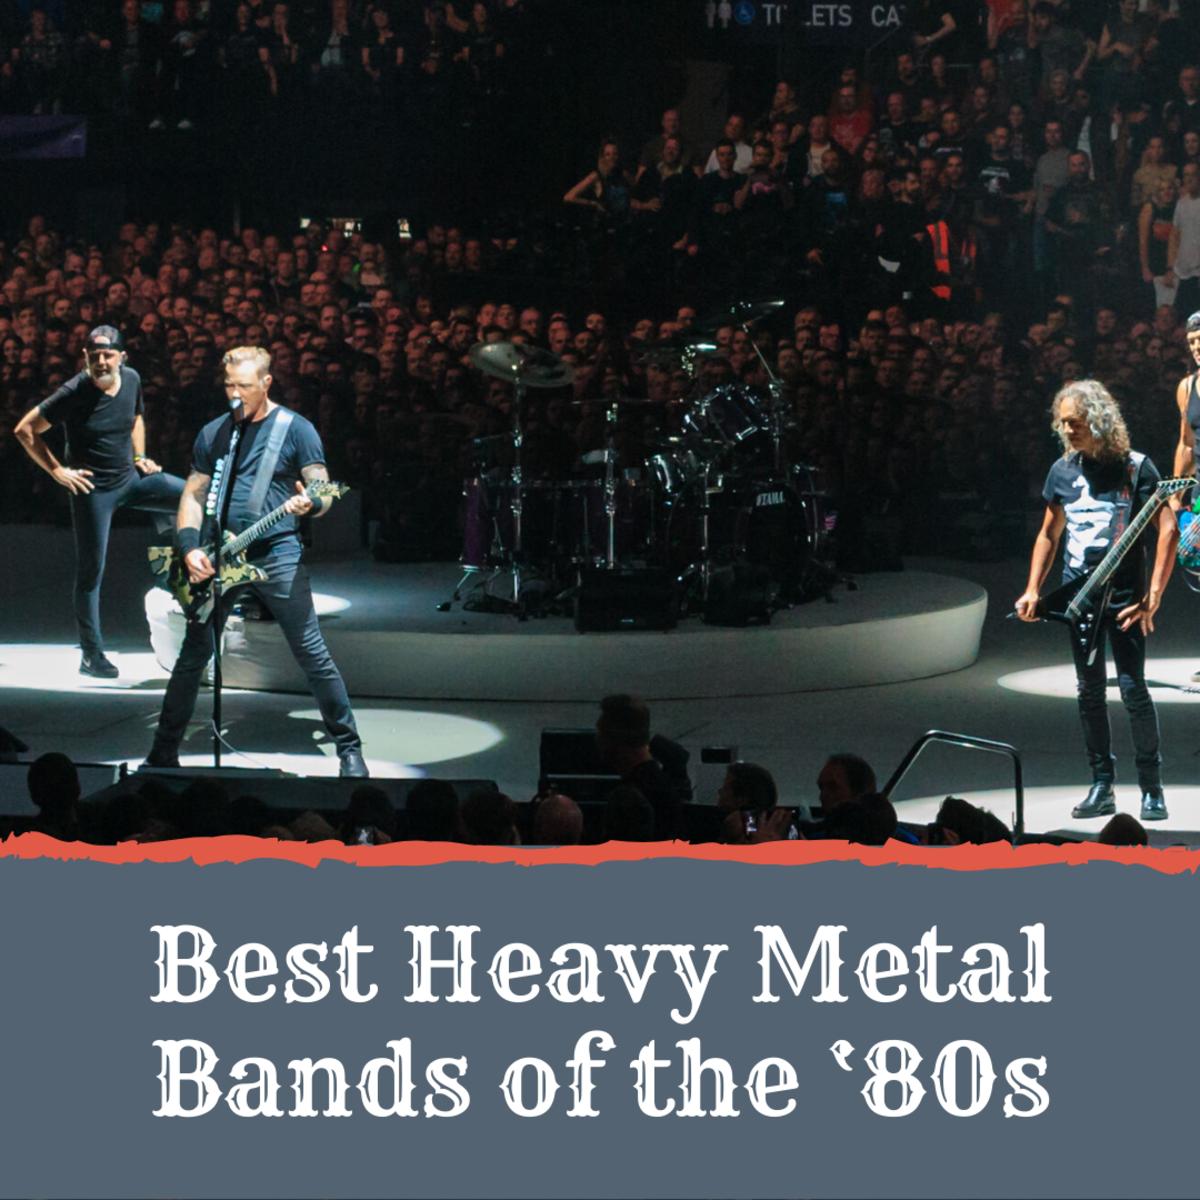 Metallica Live at The O2, London, England, 22 October 2017.